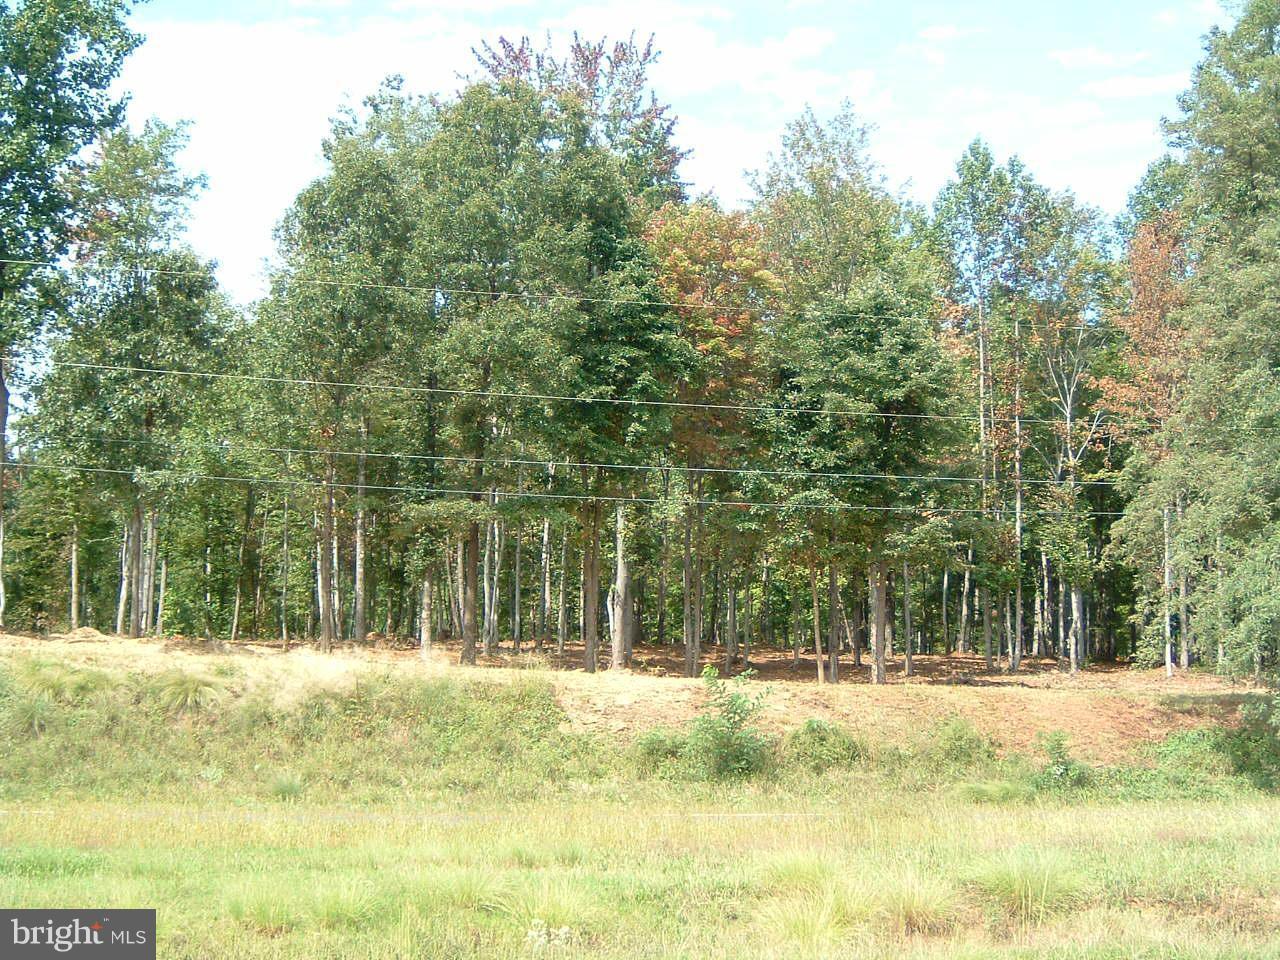 Land for Sale at Seminole Trl Madison, Virginia 22727 United States